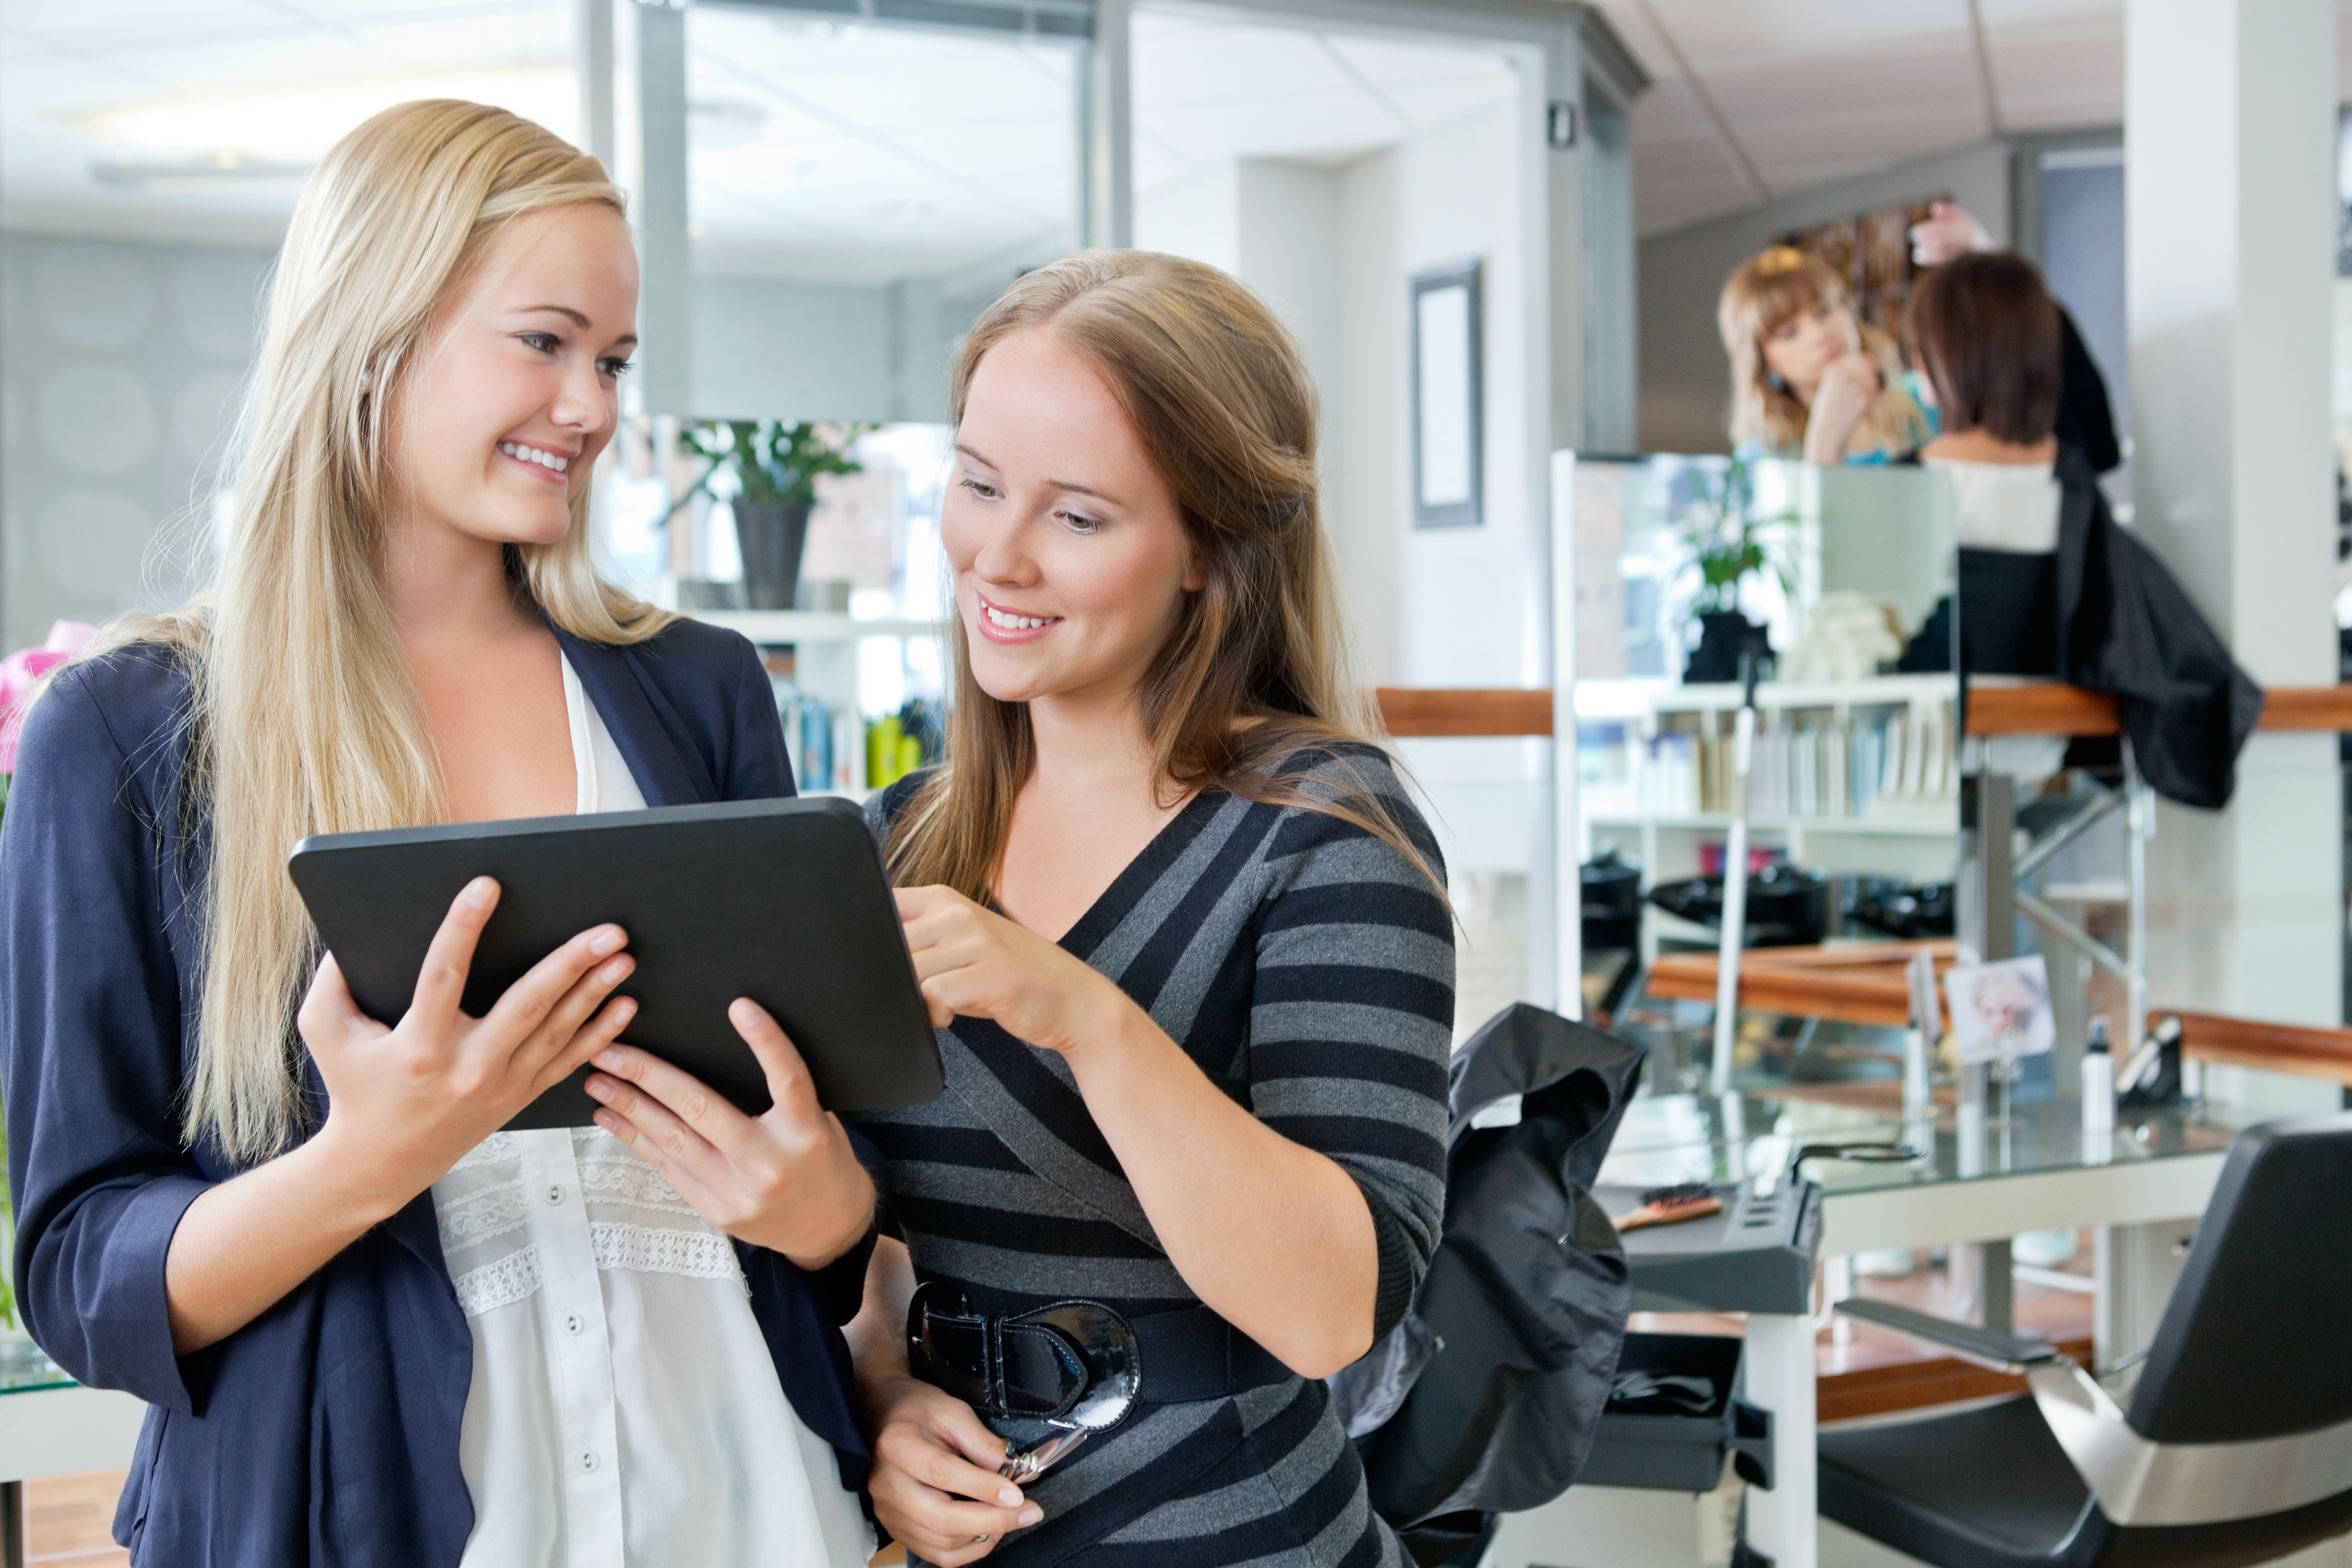 sistema de vendas hábil e inteligente